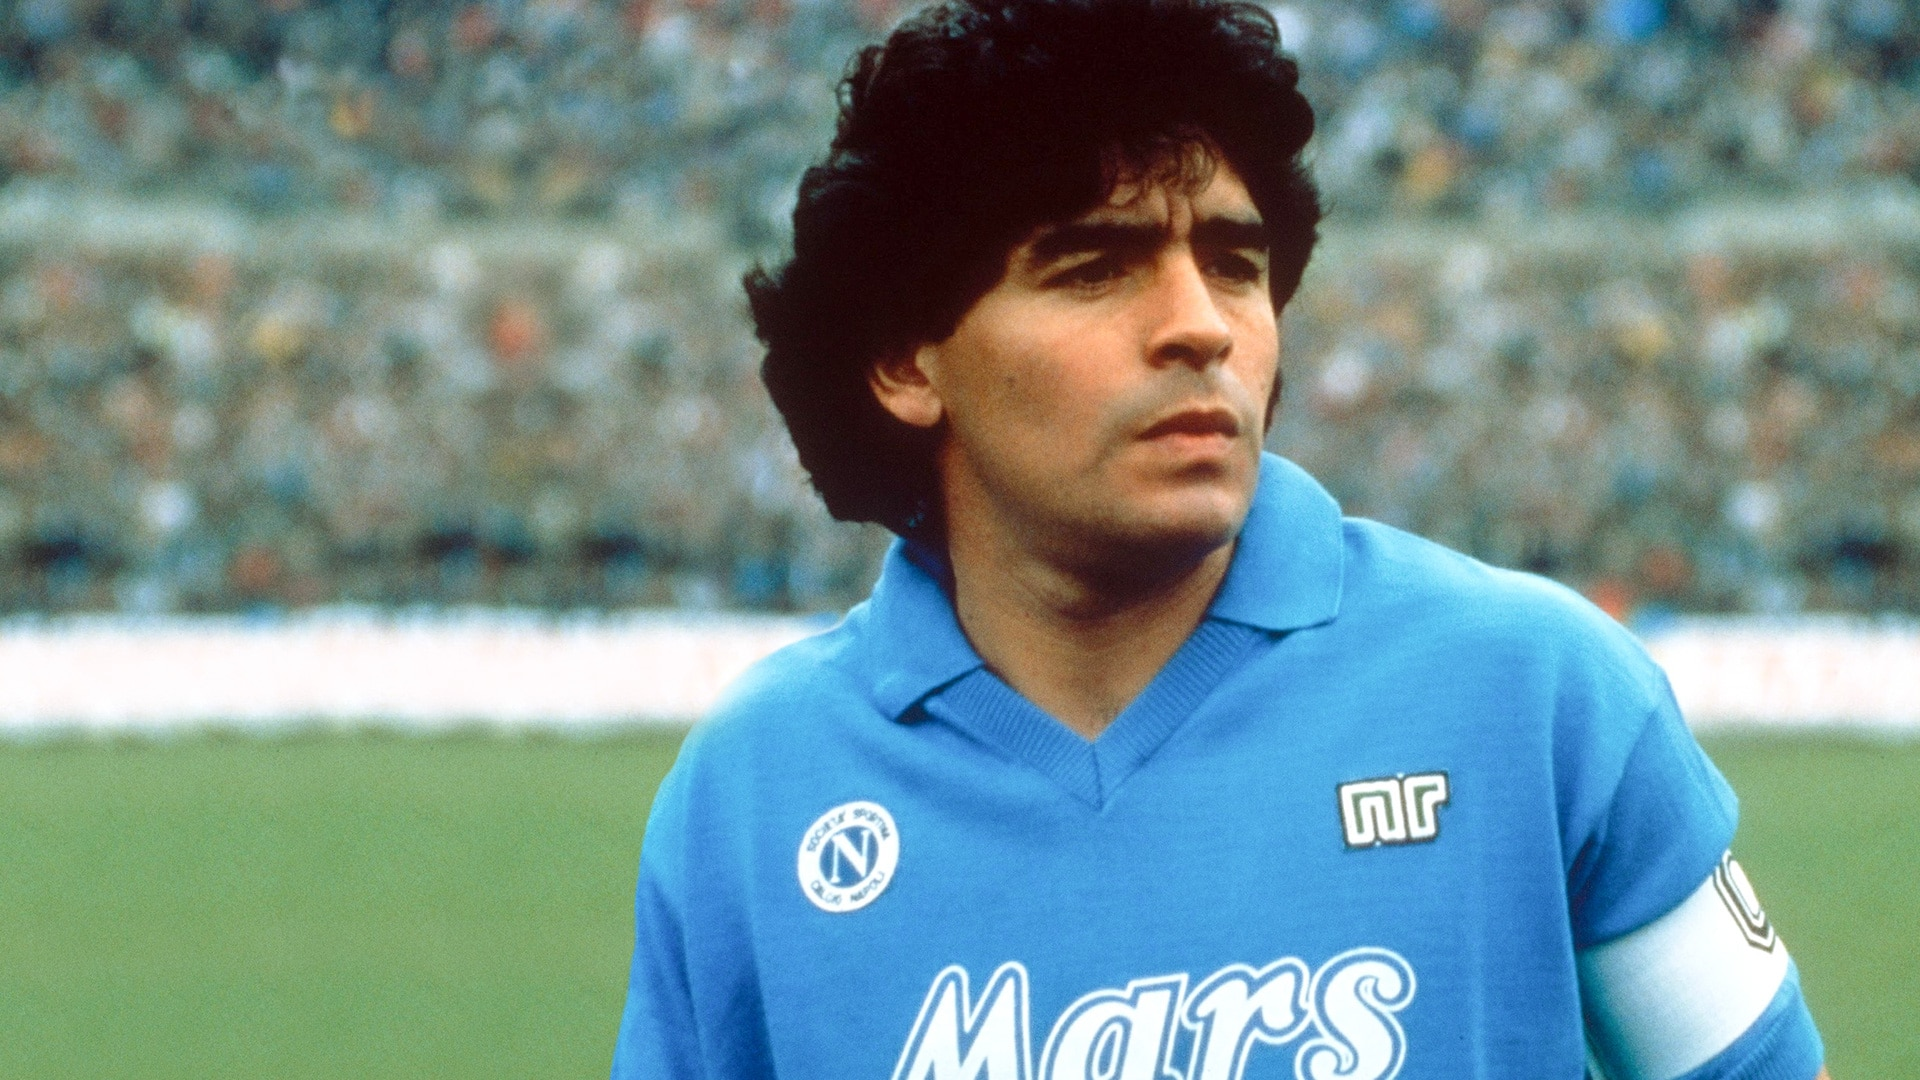 Diego Maradona All 4